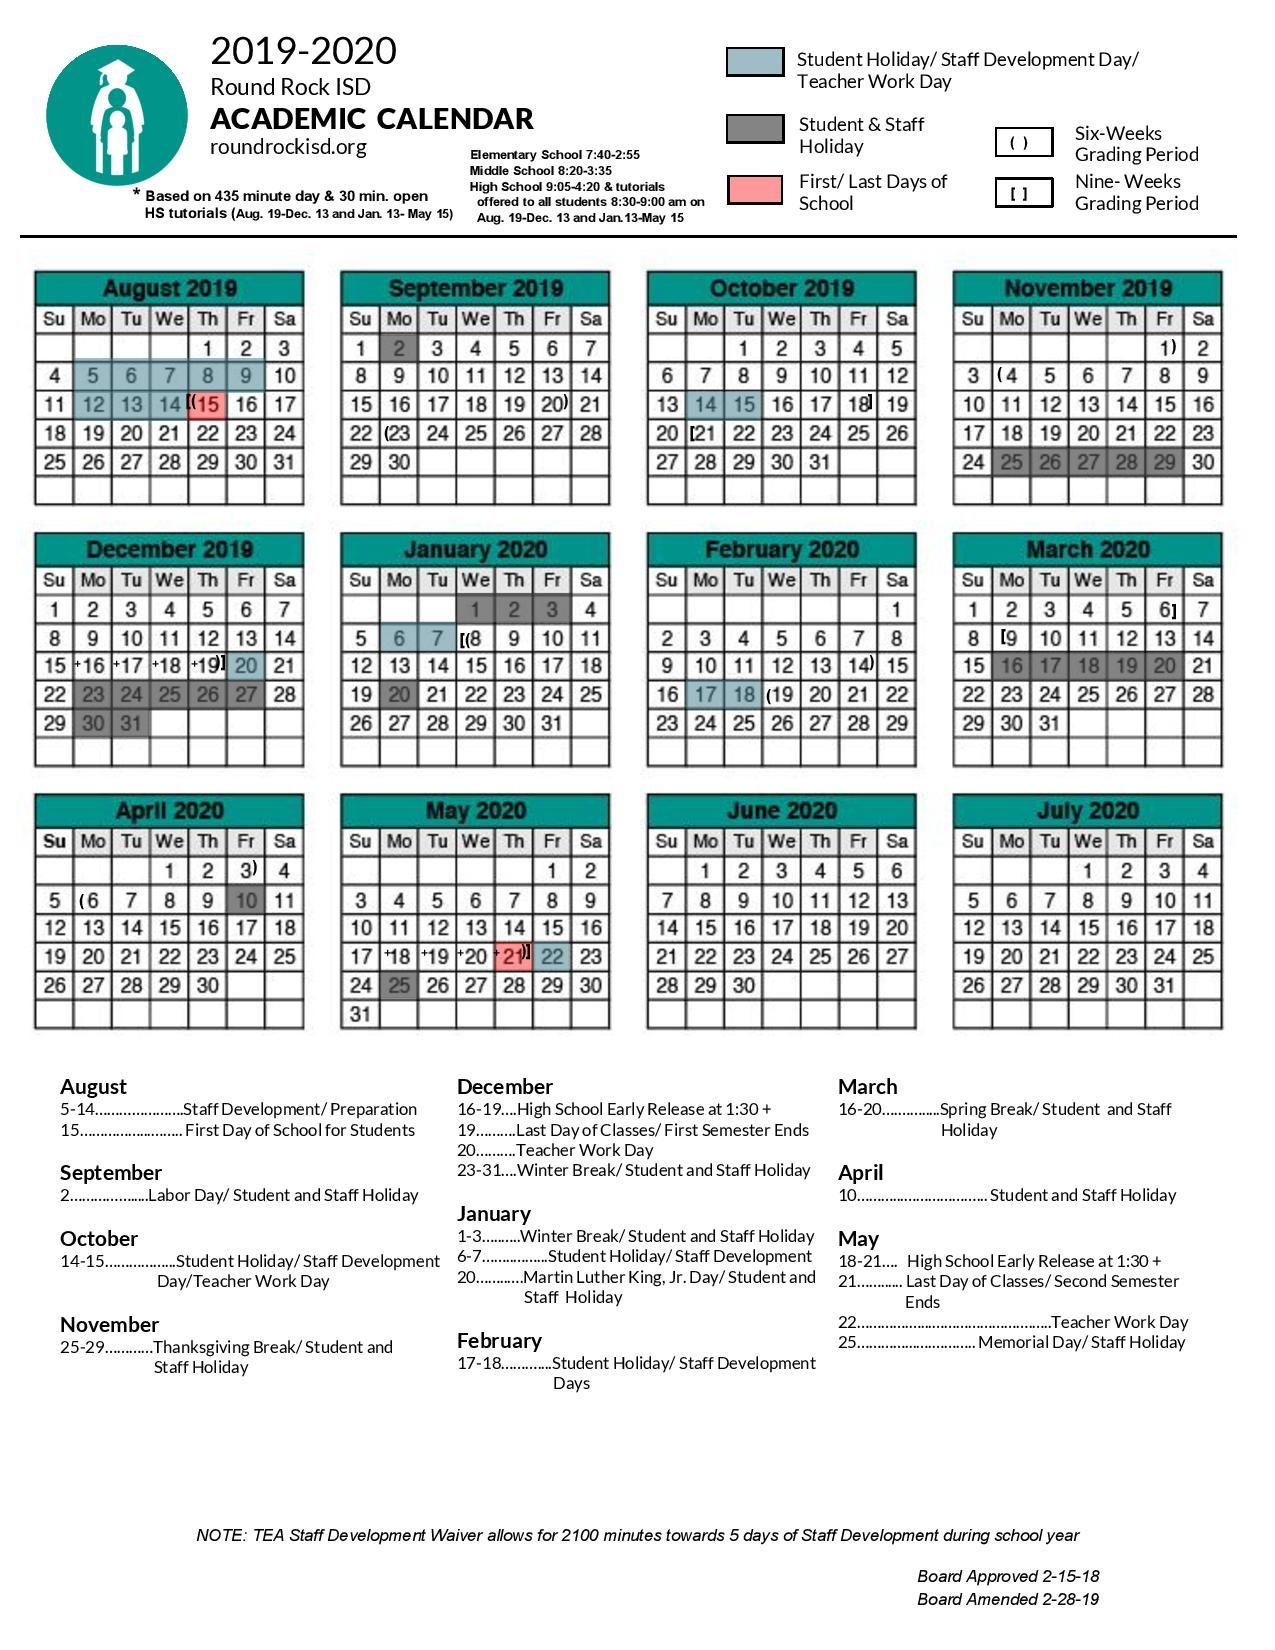 Round Rock ISD Calendar Printable Images Free Download https://